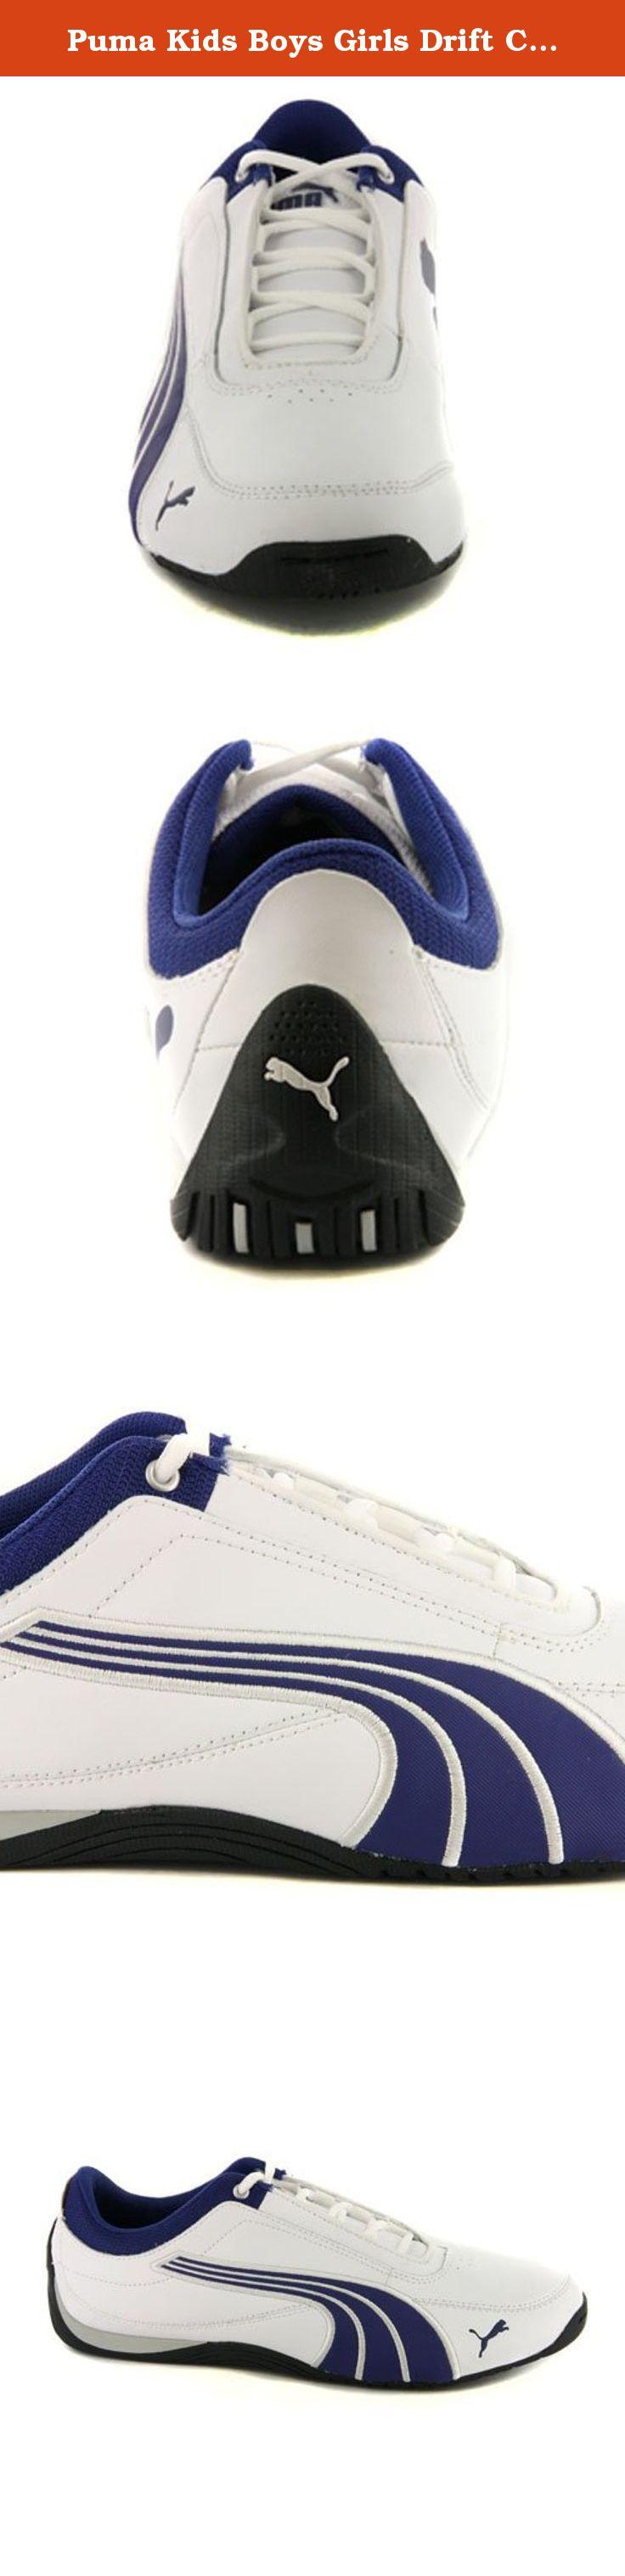 Puma Kids Boys Girls Drift Cat 4 White Leather Sneakers US 5